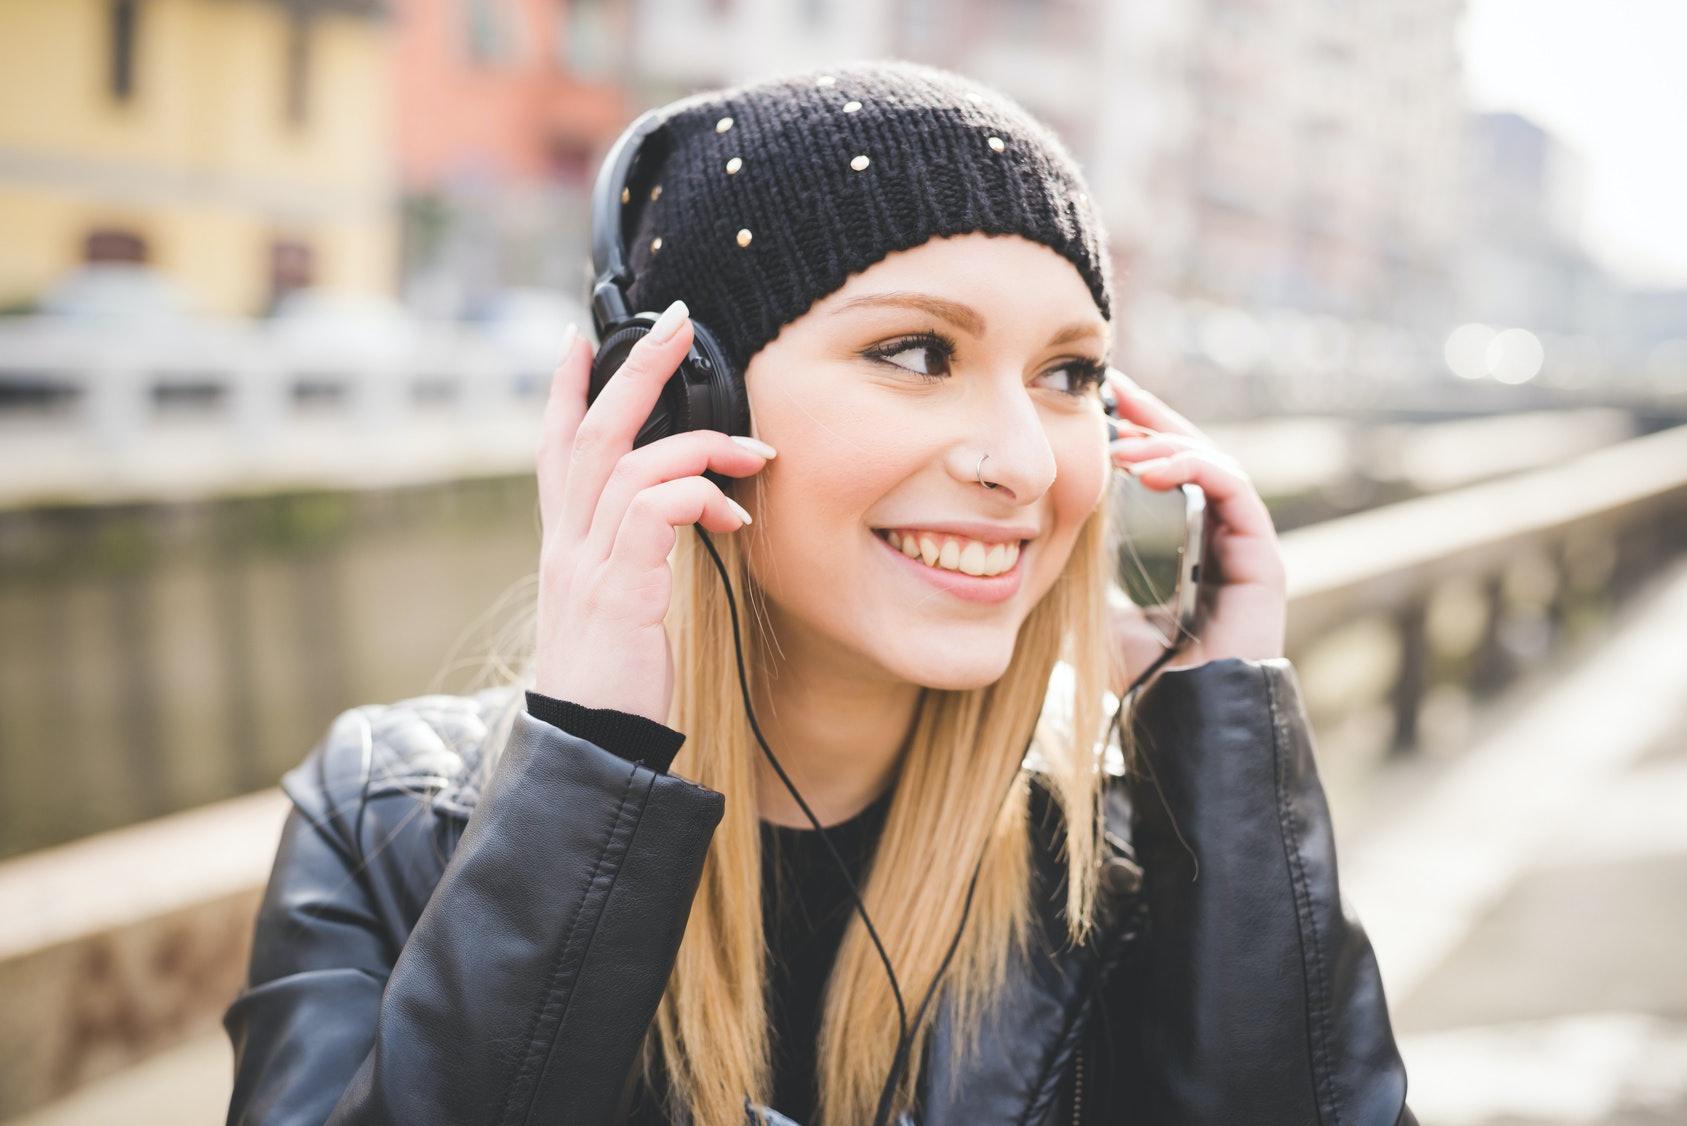 online dating bilder fjernkontroll truse vibrator